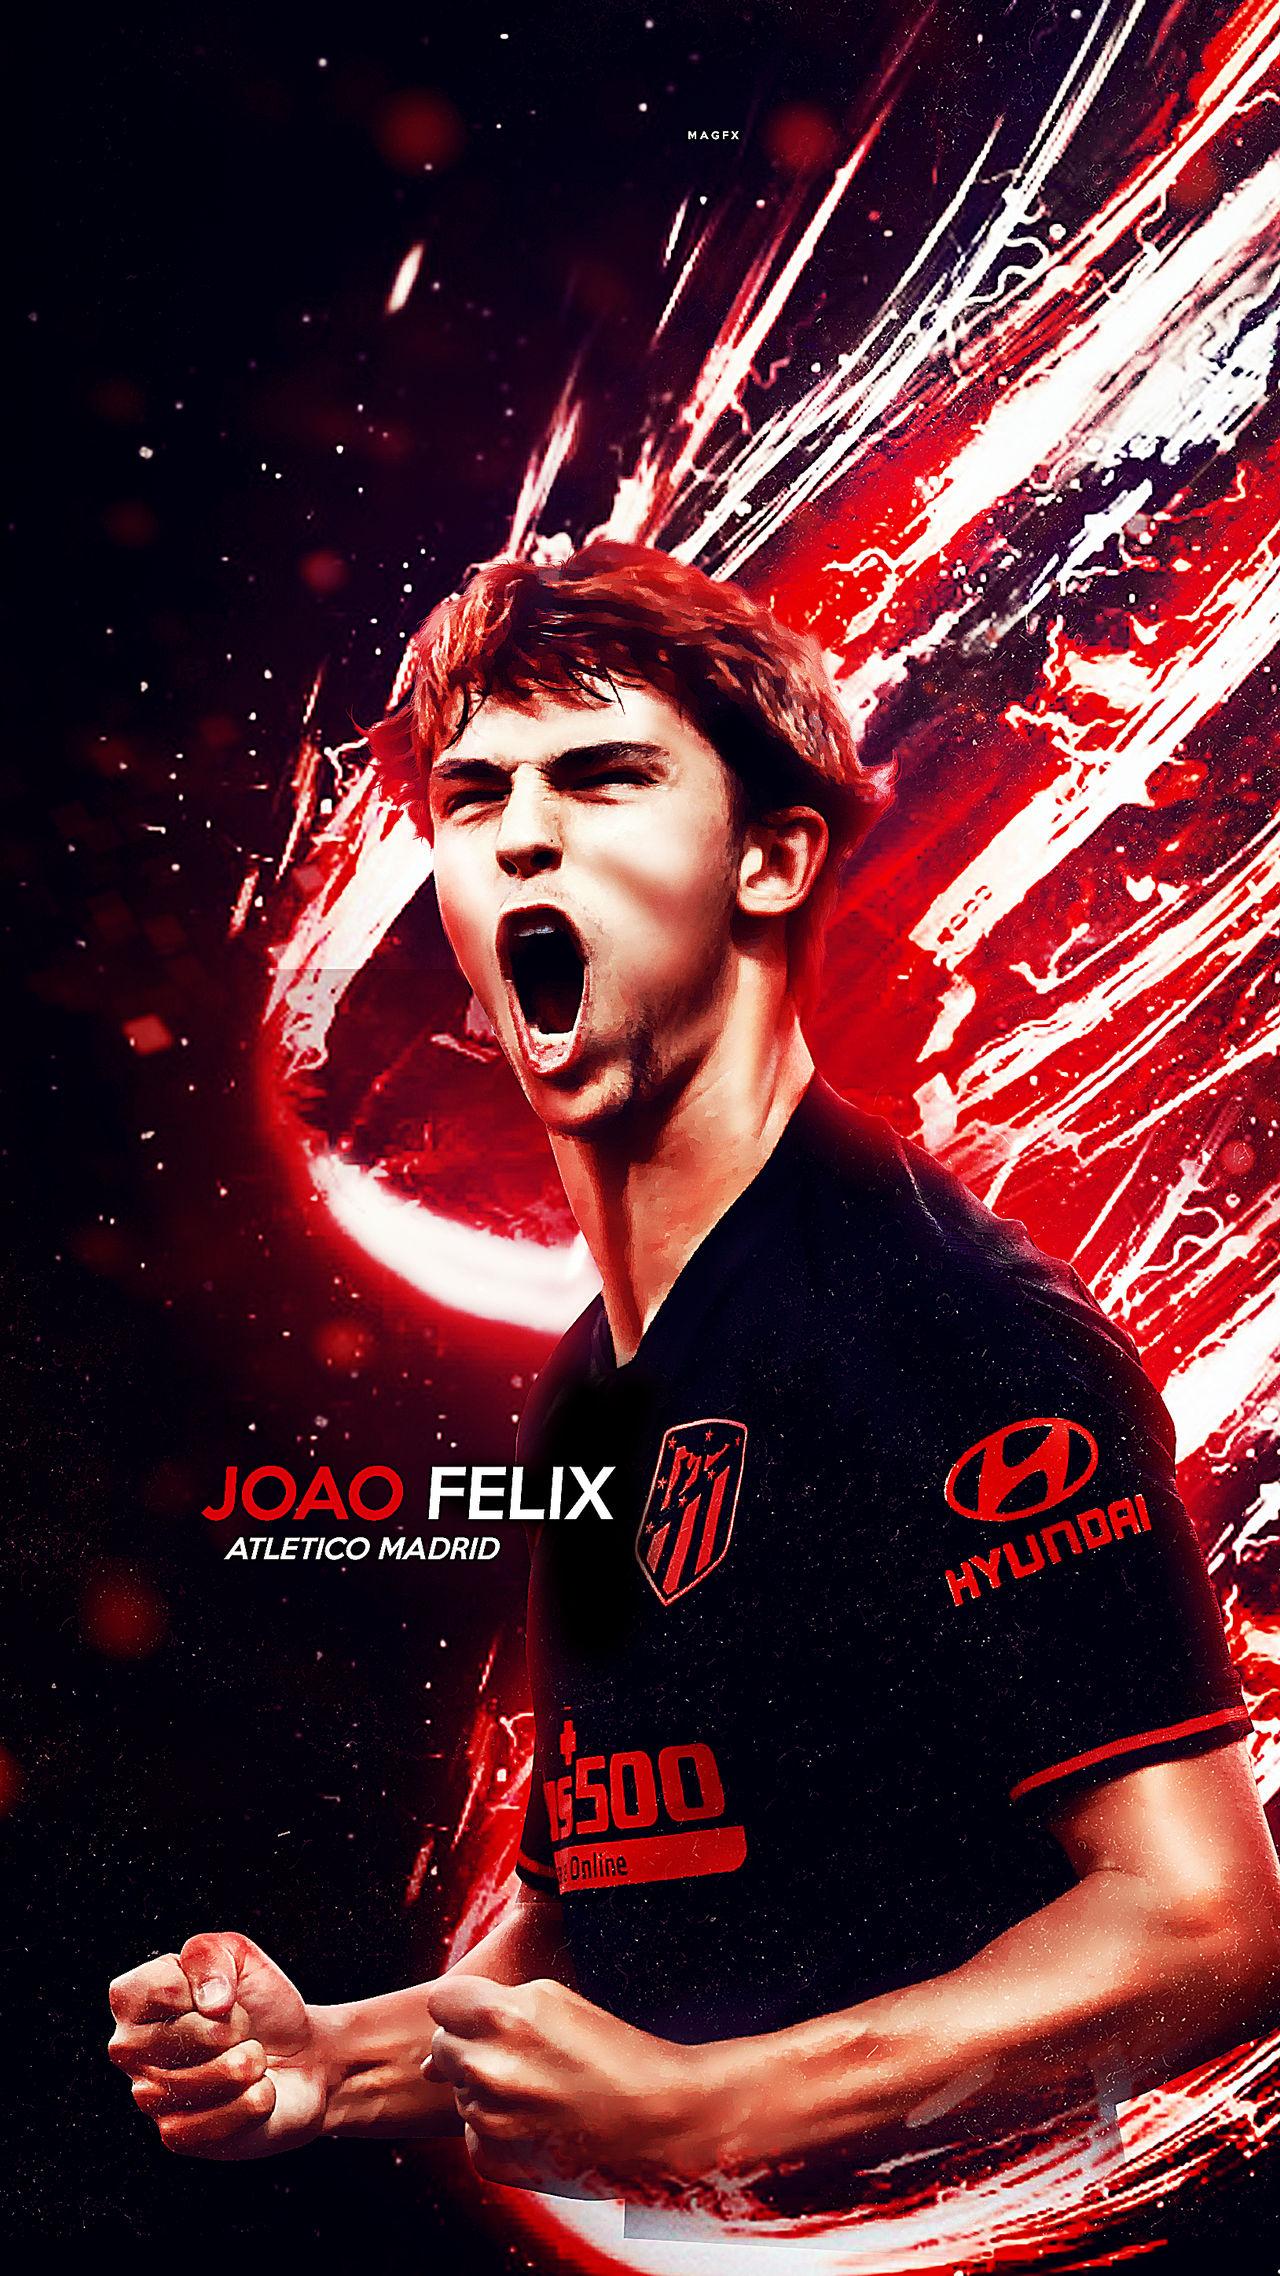 Joao Felix Wallpaper Lockscreen 2020 By Mohamedgfx10 On Deviantart